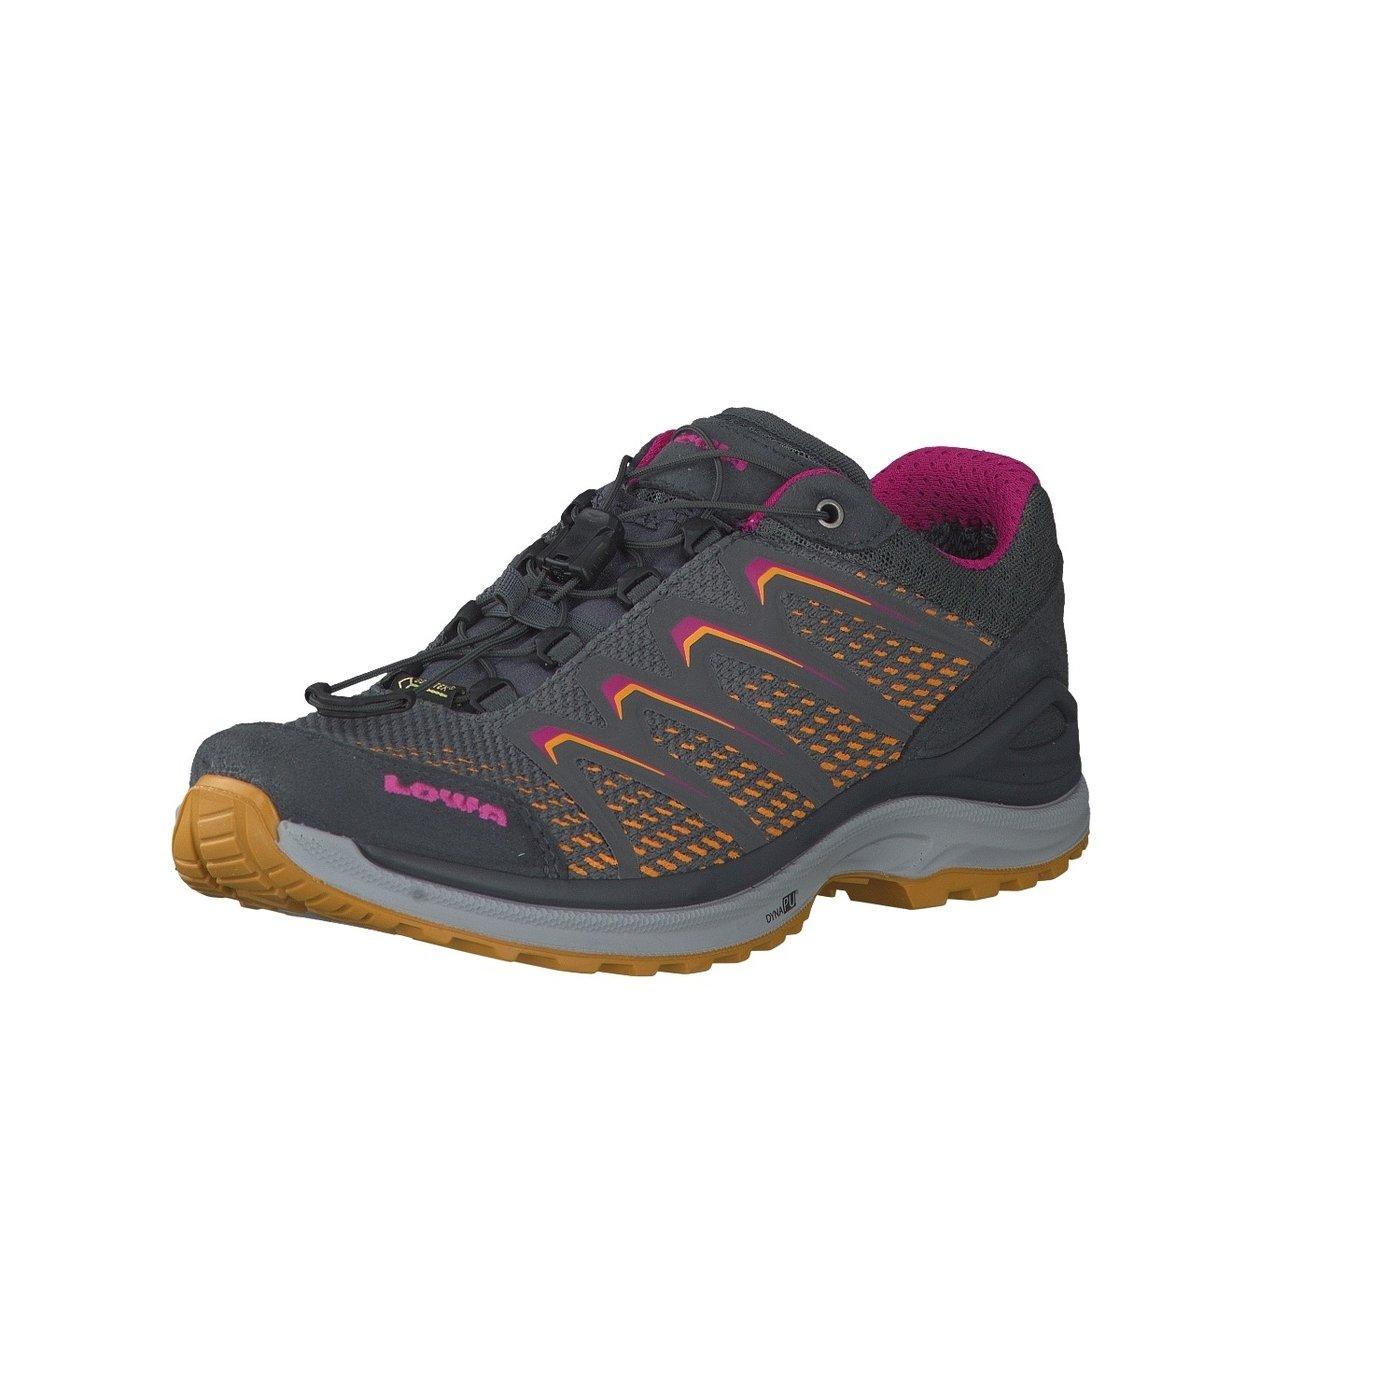 Lowa Maddox GTX Lo, Chaussures de Randonnée Hautes Femme 320609